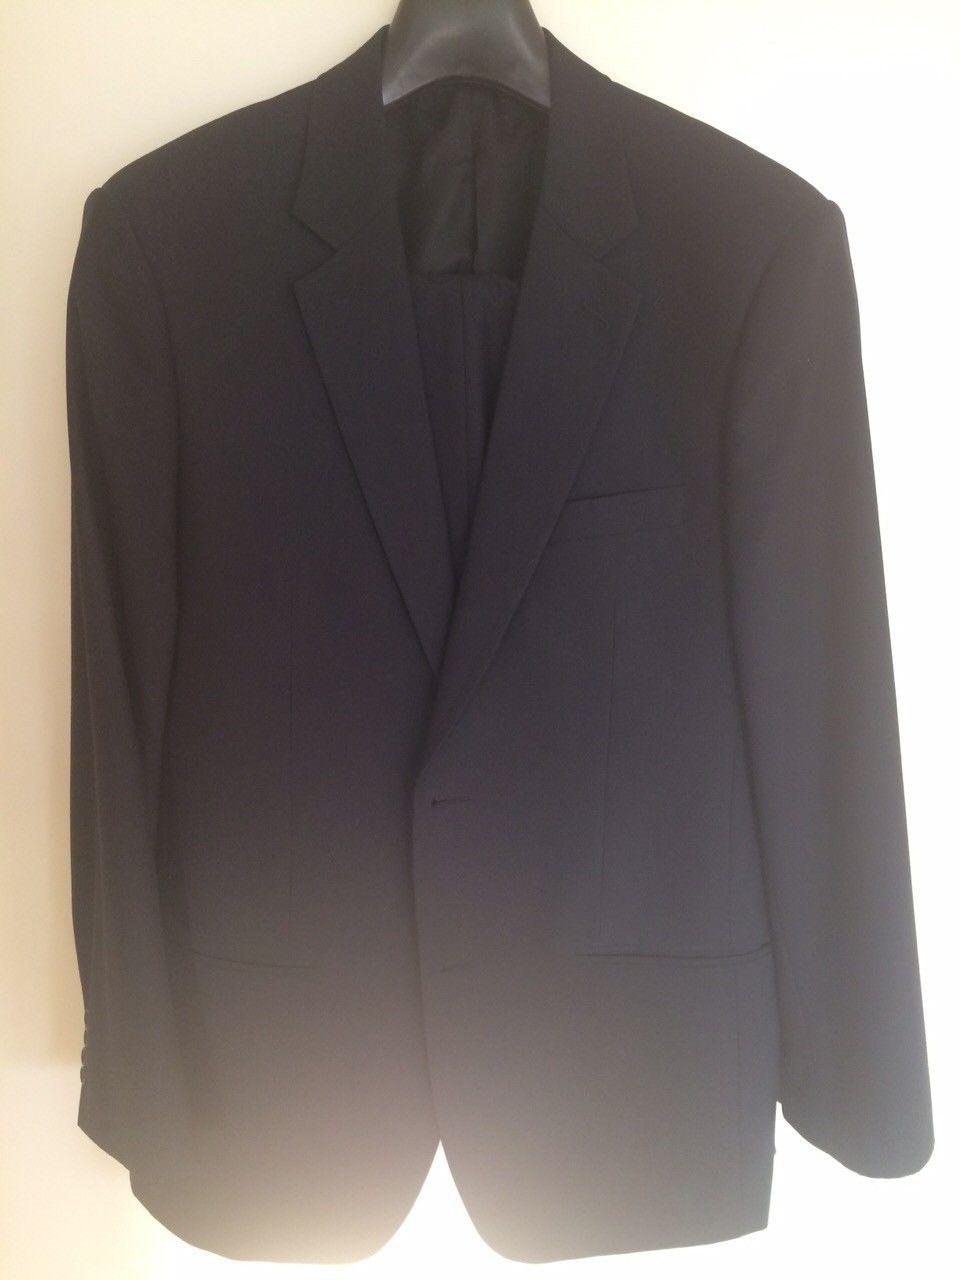 Marineblå dress i cashmereull str 52 - Oslo  - Pent brukt marineblå dress i cashmereull. Størrelse 52. - Oslo